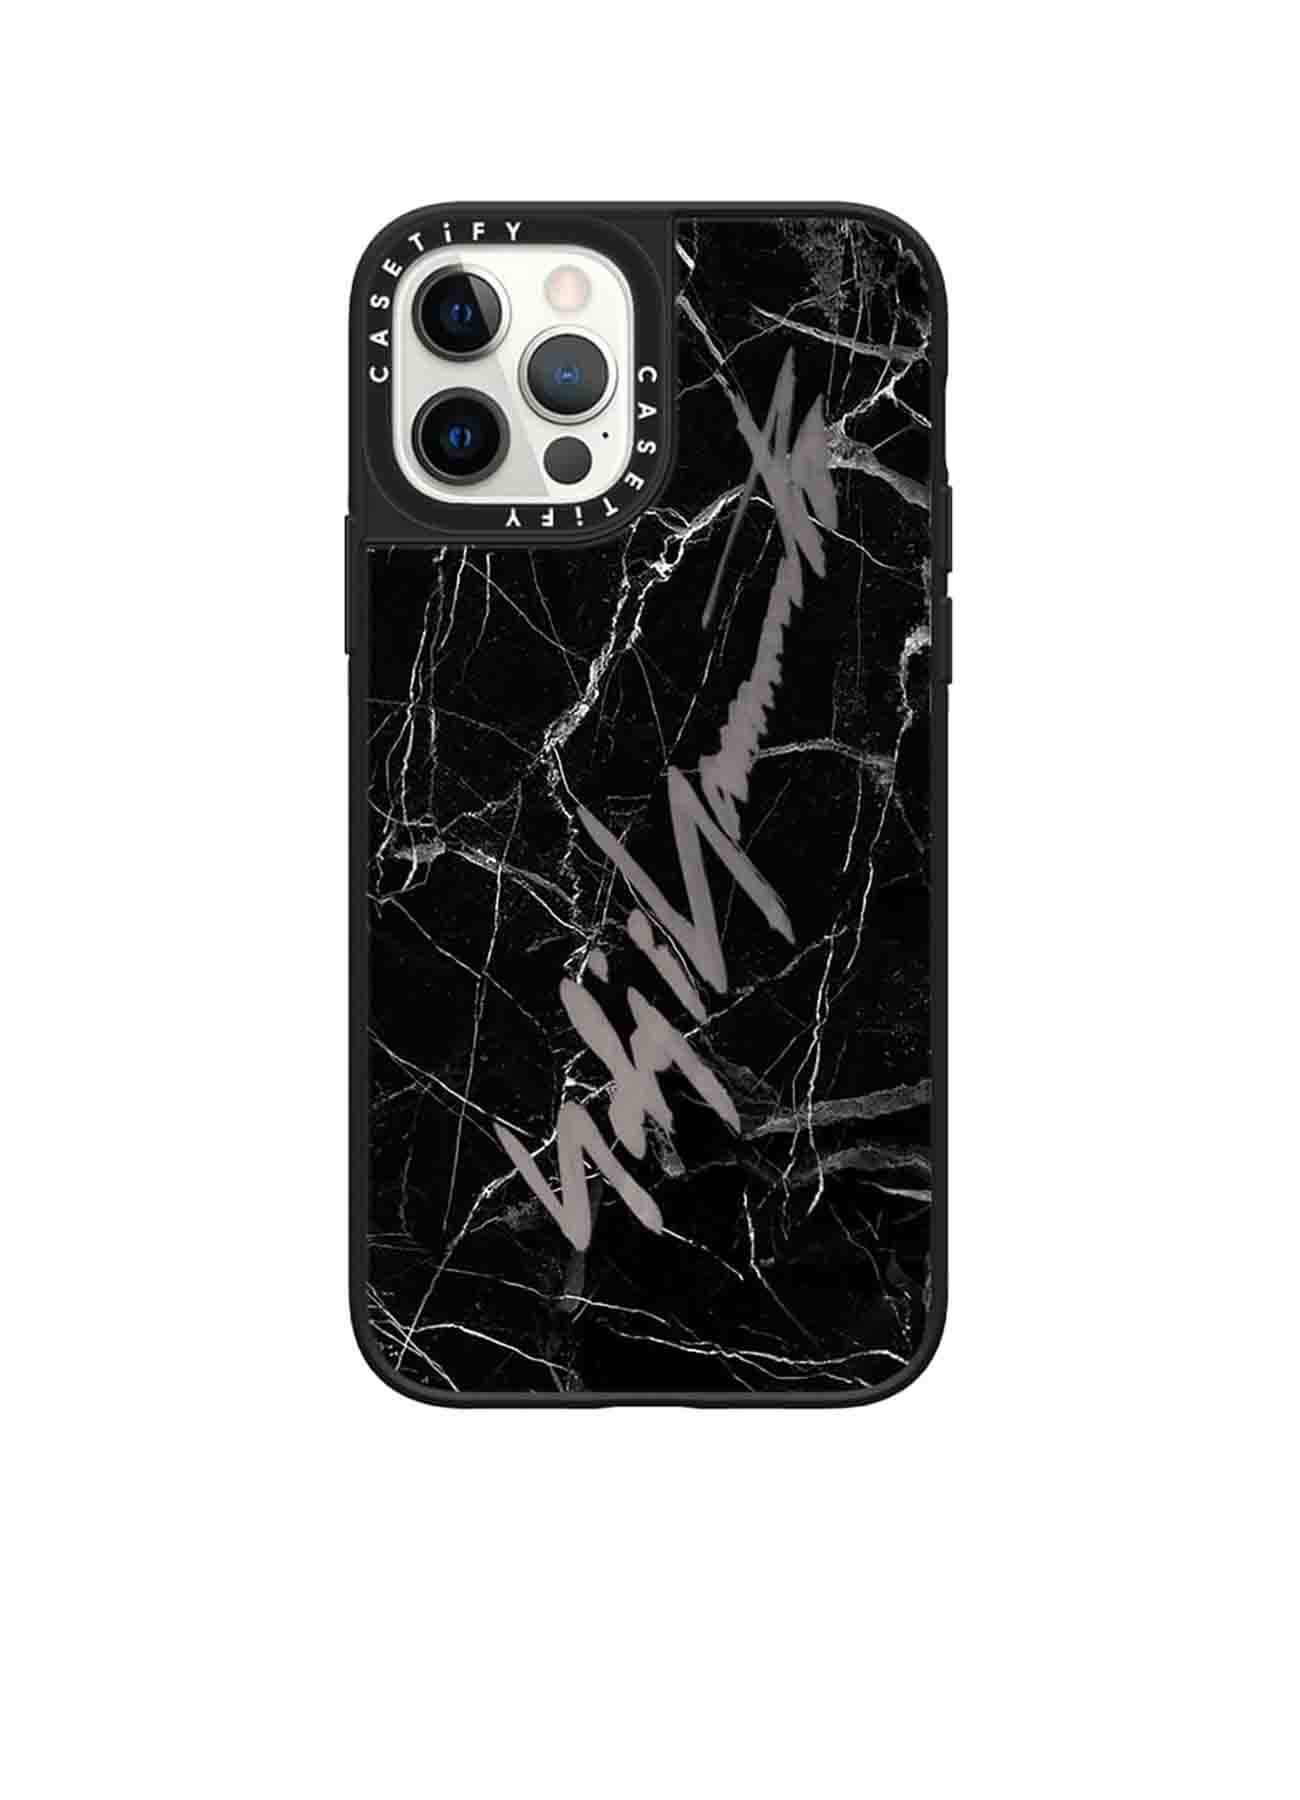 Yohji Yamamoto × CASETiFY Signature iPhone Essential Case